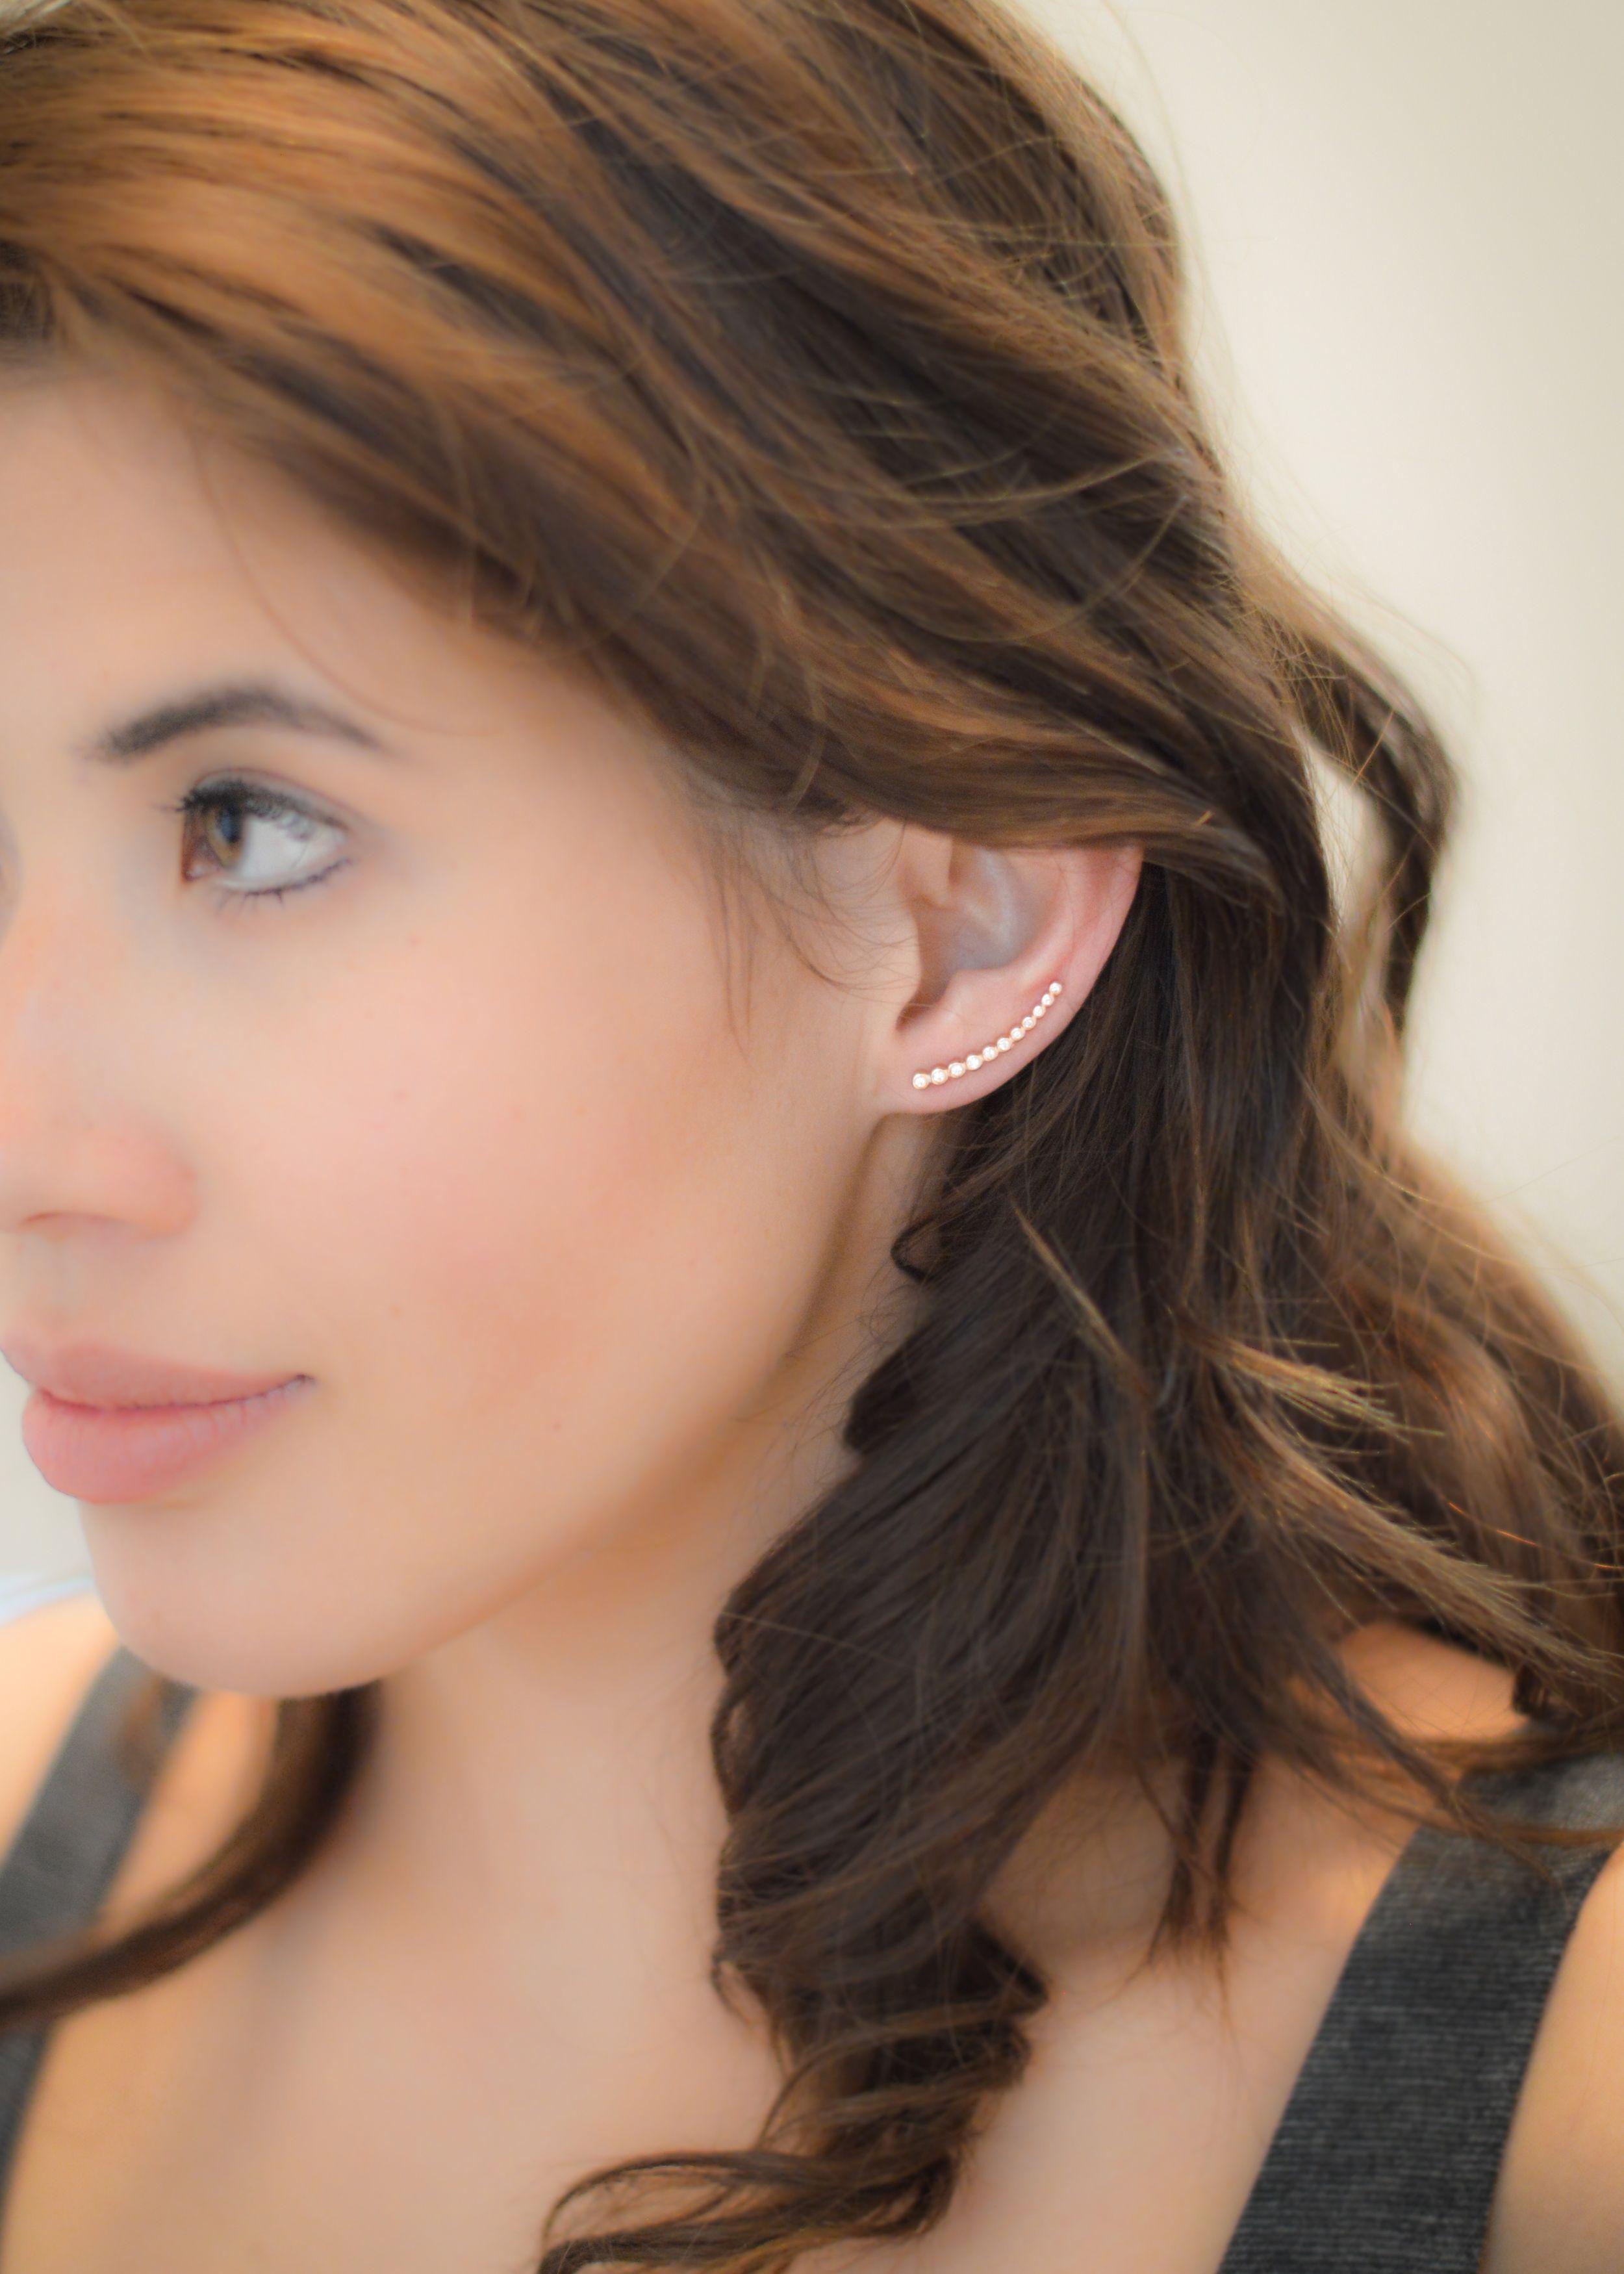 58392b8538c1e Leah Alexandra Astro Rose Gold Ear Climber | Leah Alexandra | Pearl ...